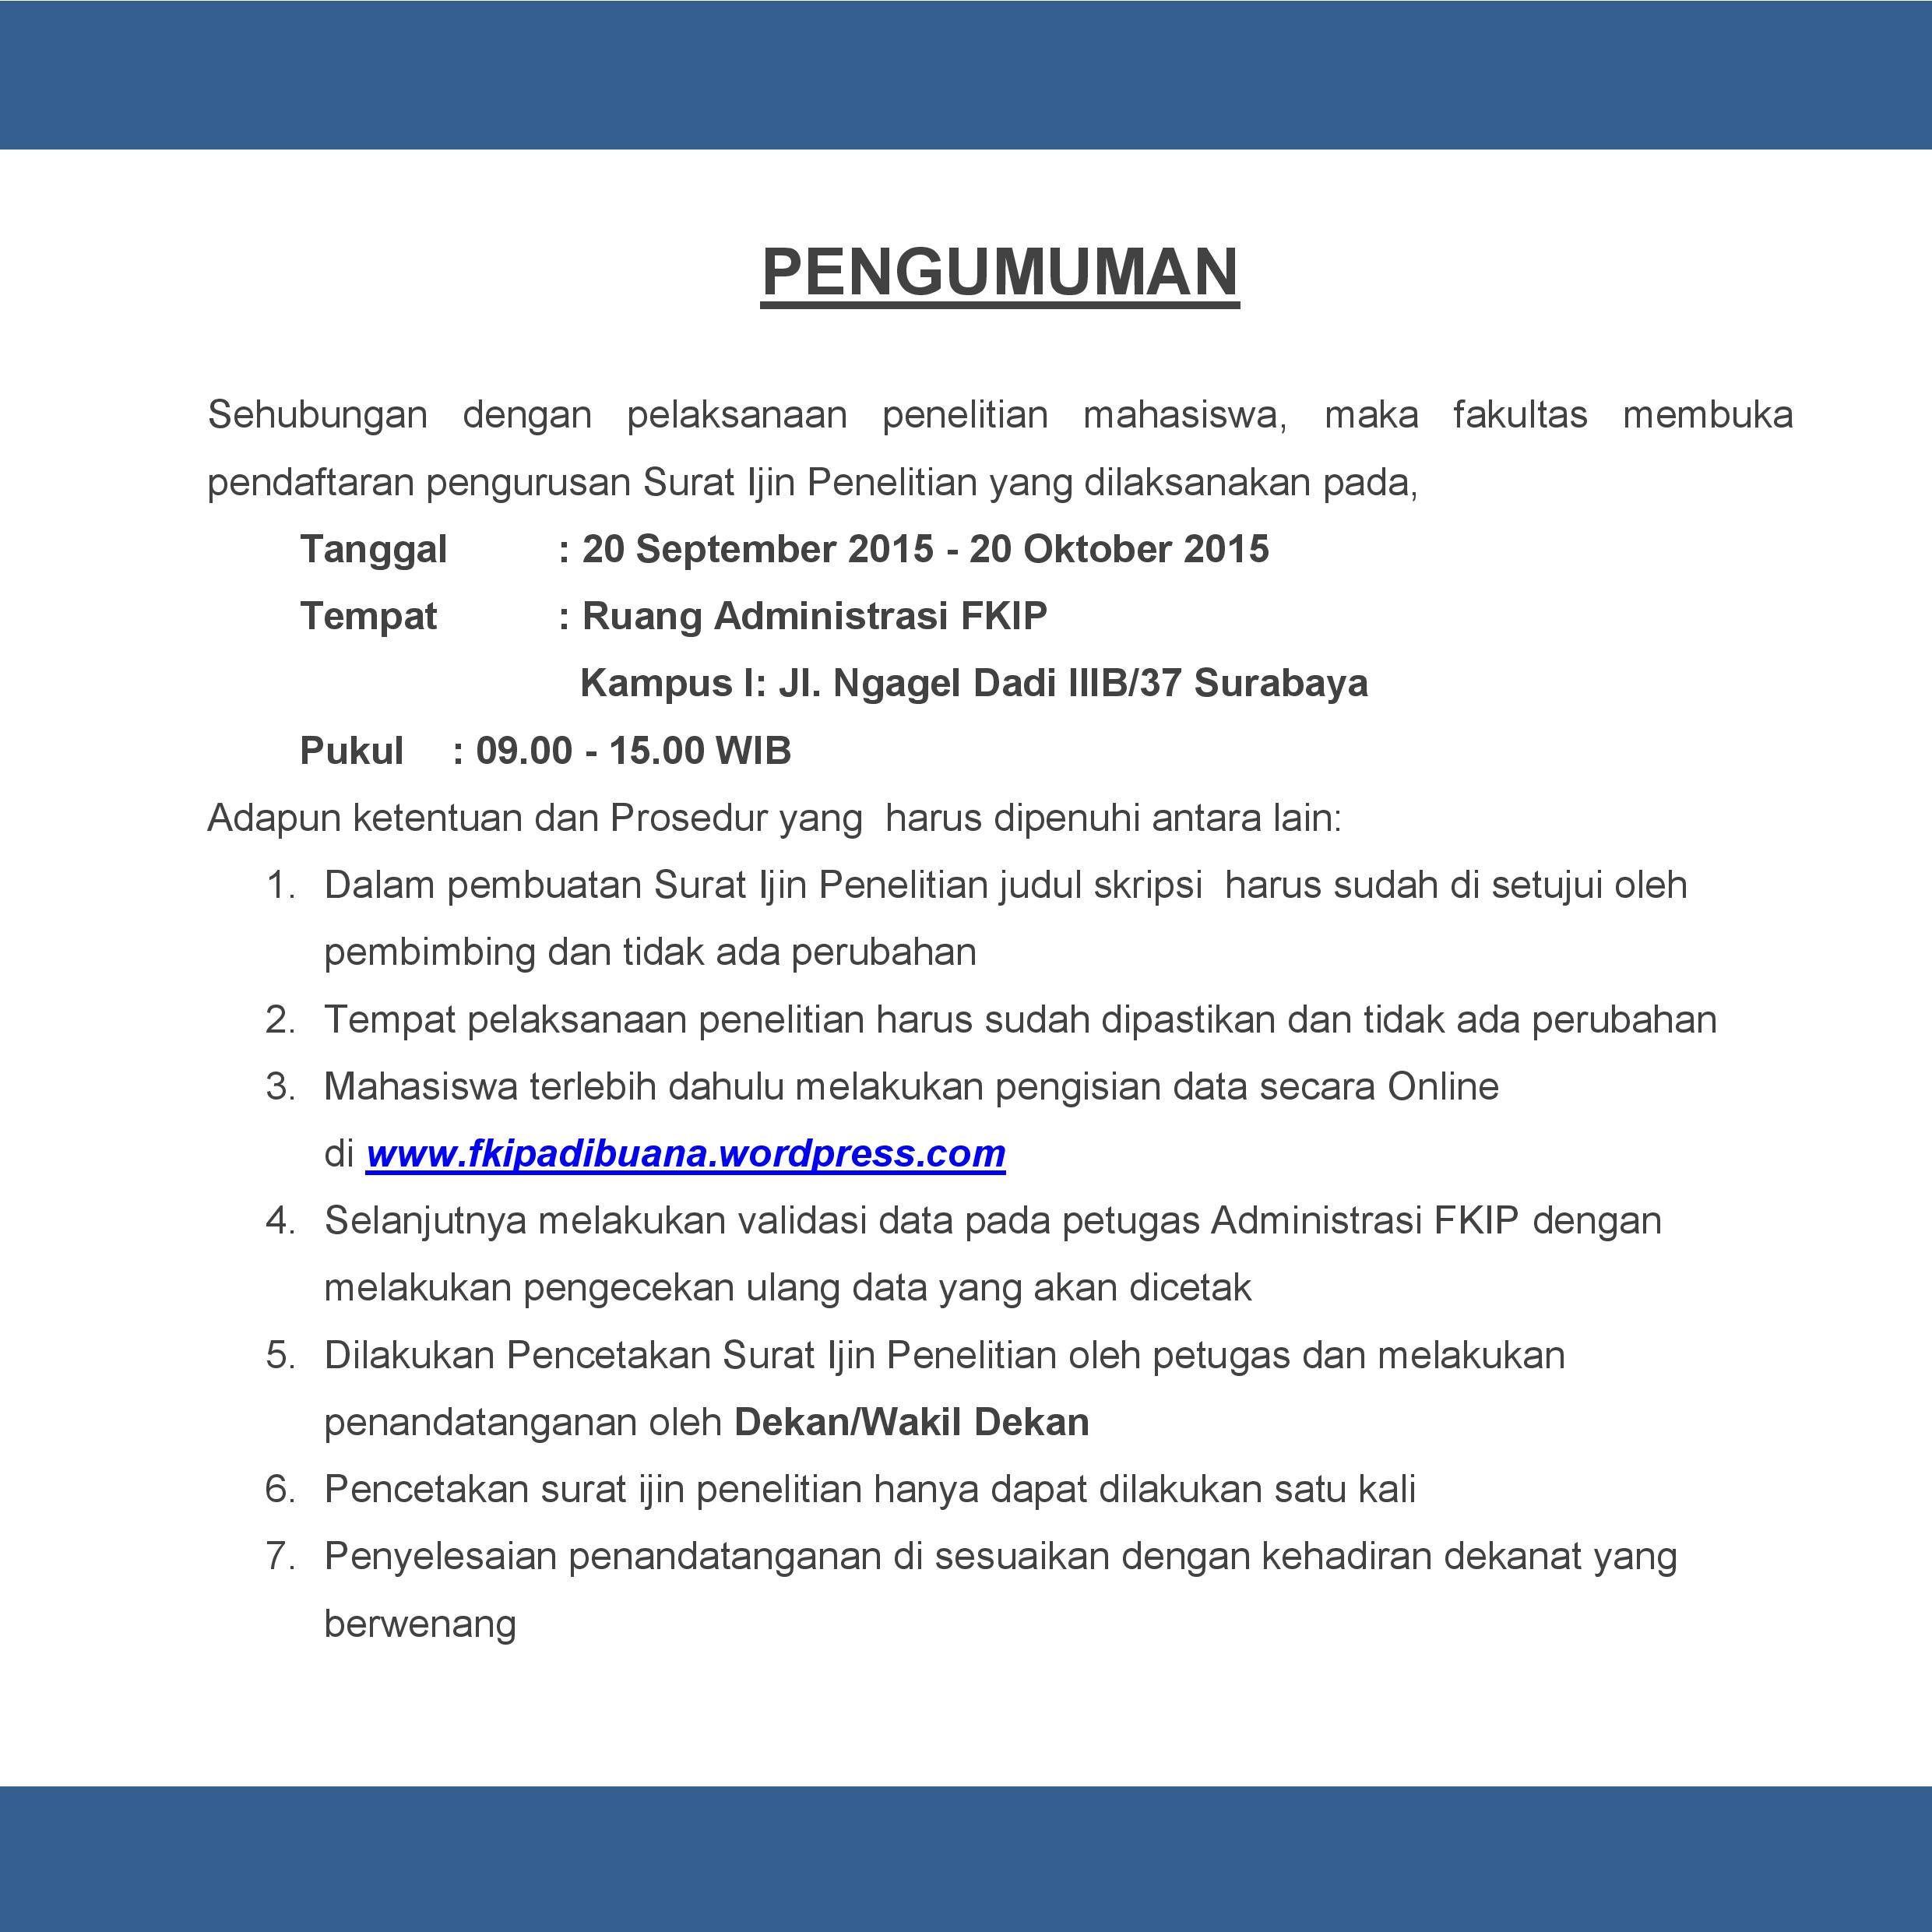 PENGUMUMAN surat ijin penelitian-page-001